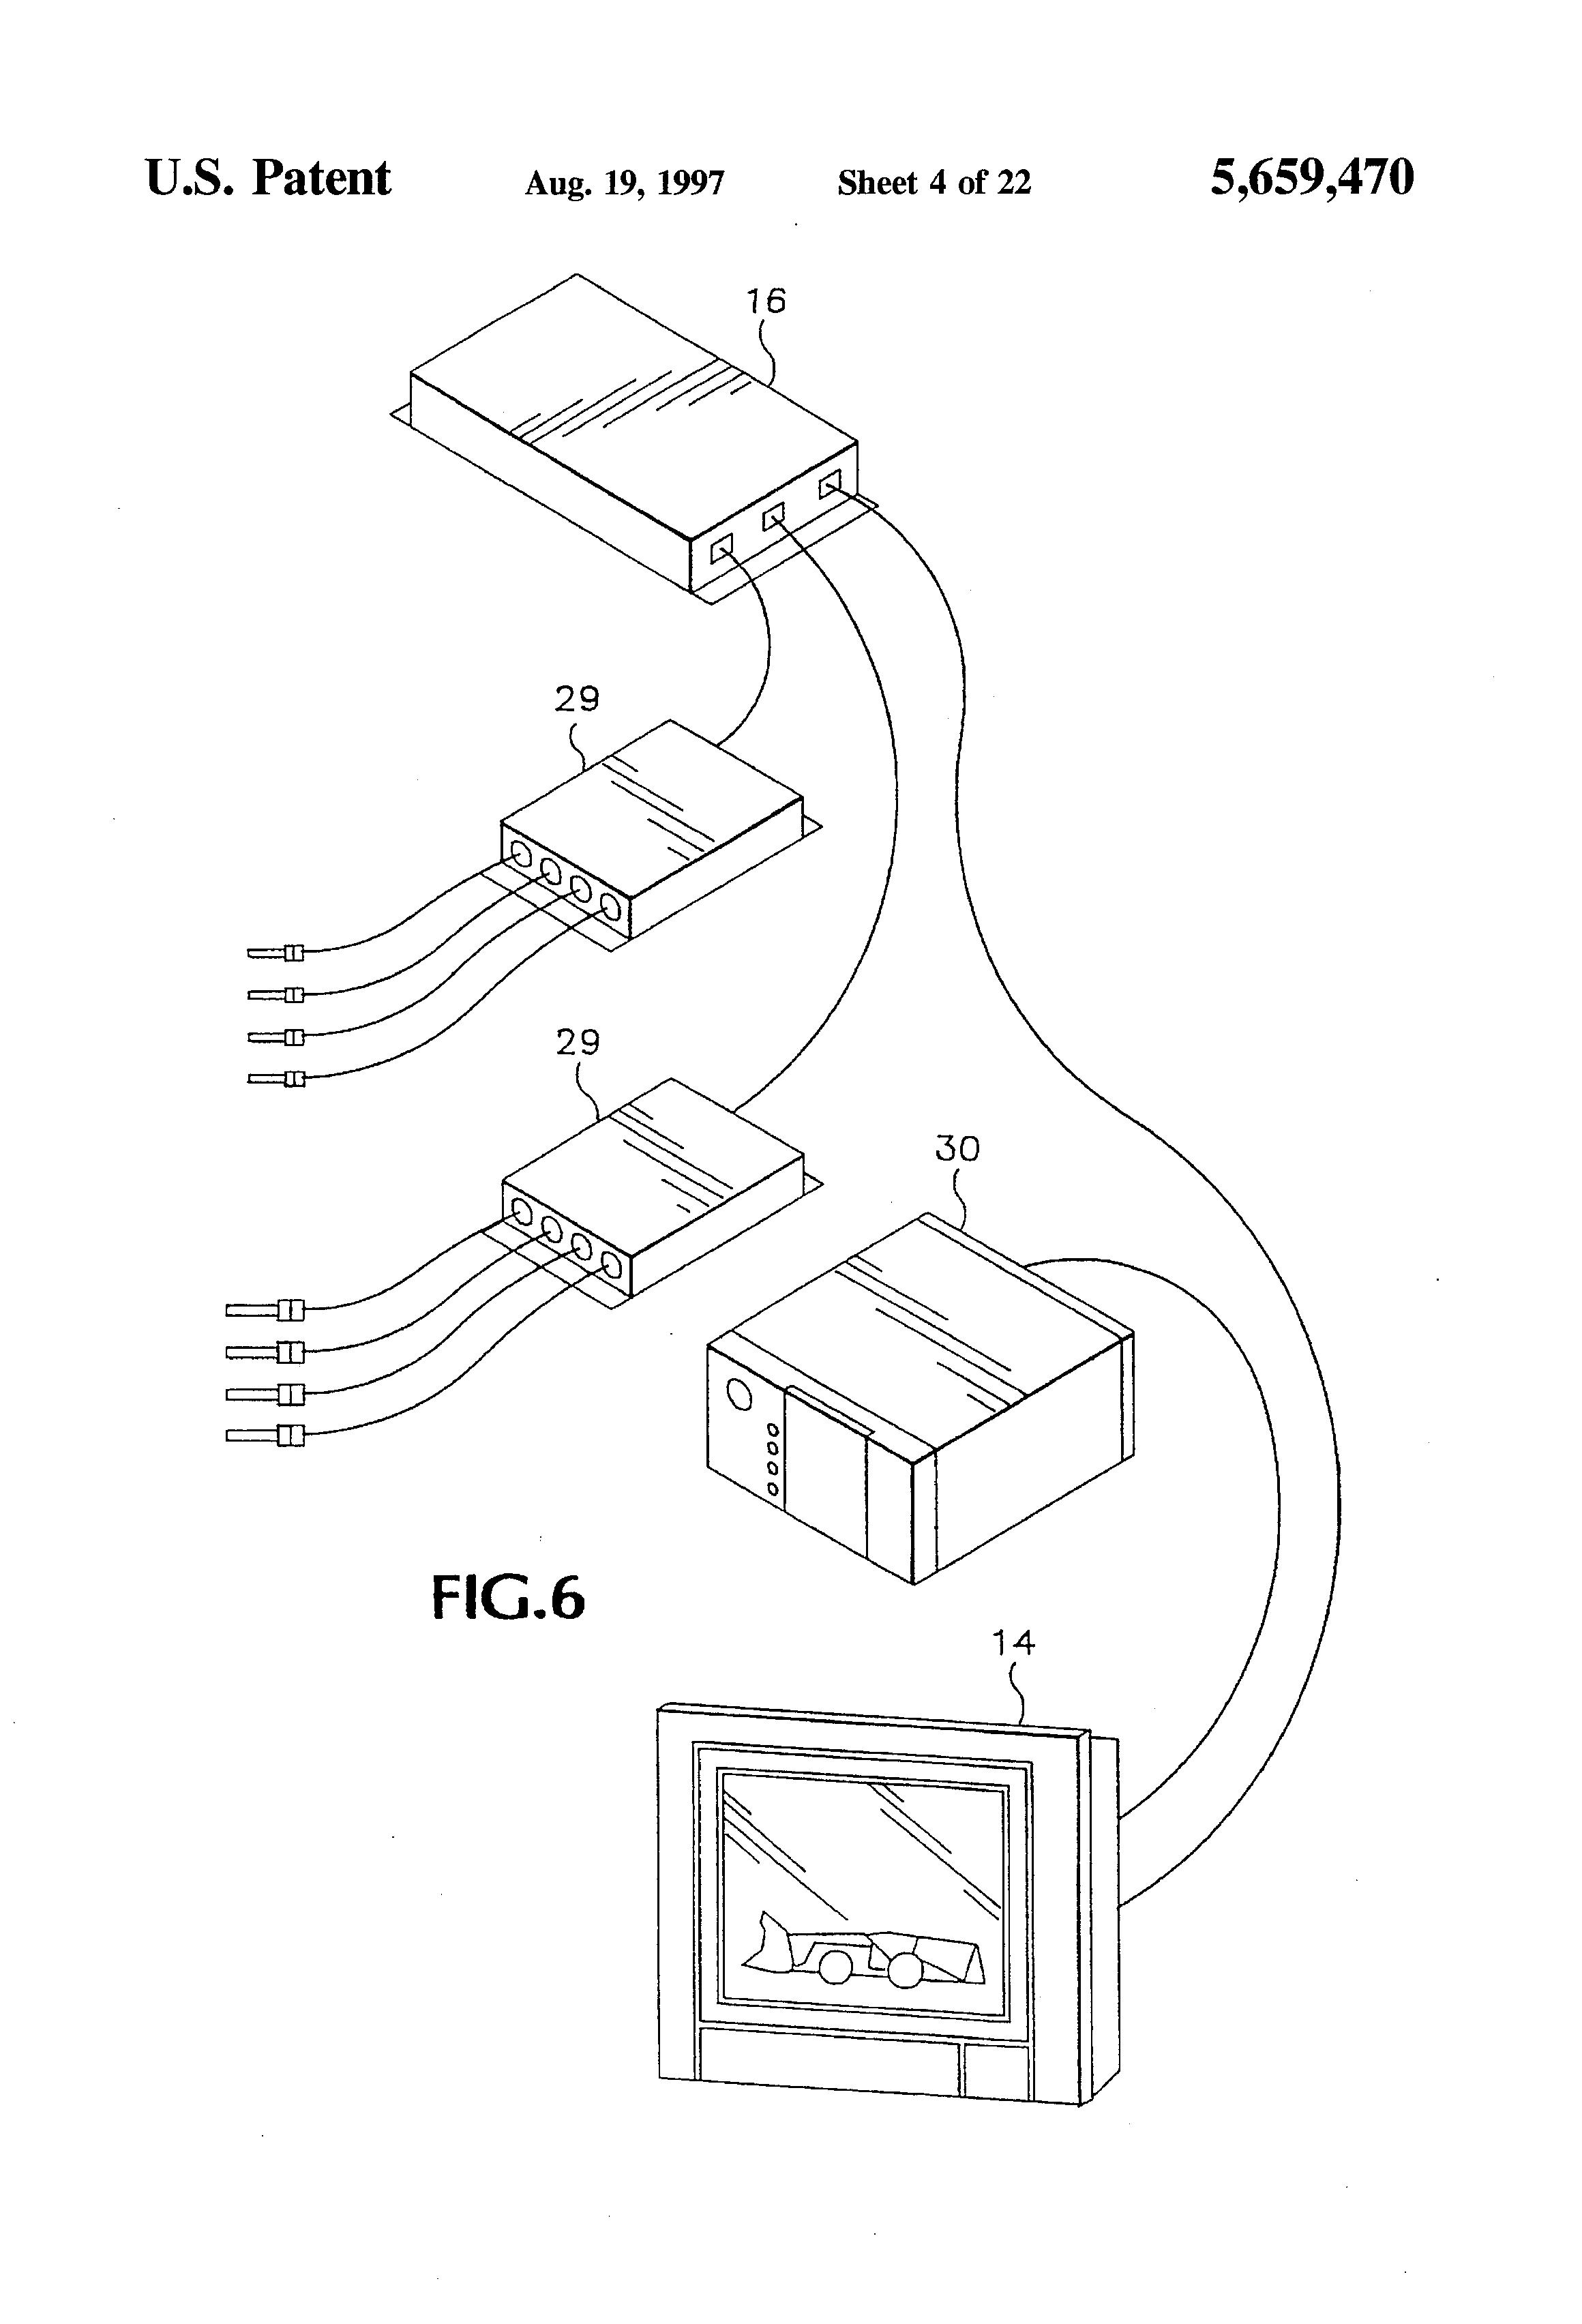 Dji Wiring Diagram Auto Electrical Nissan Micra Free Memory Card Reader